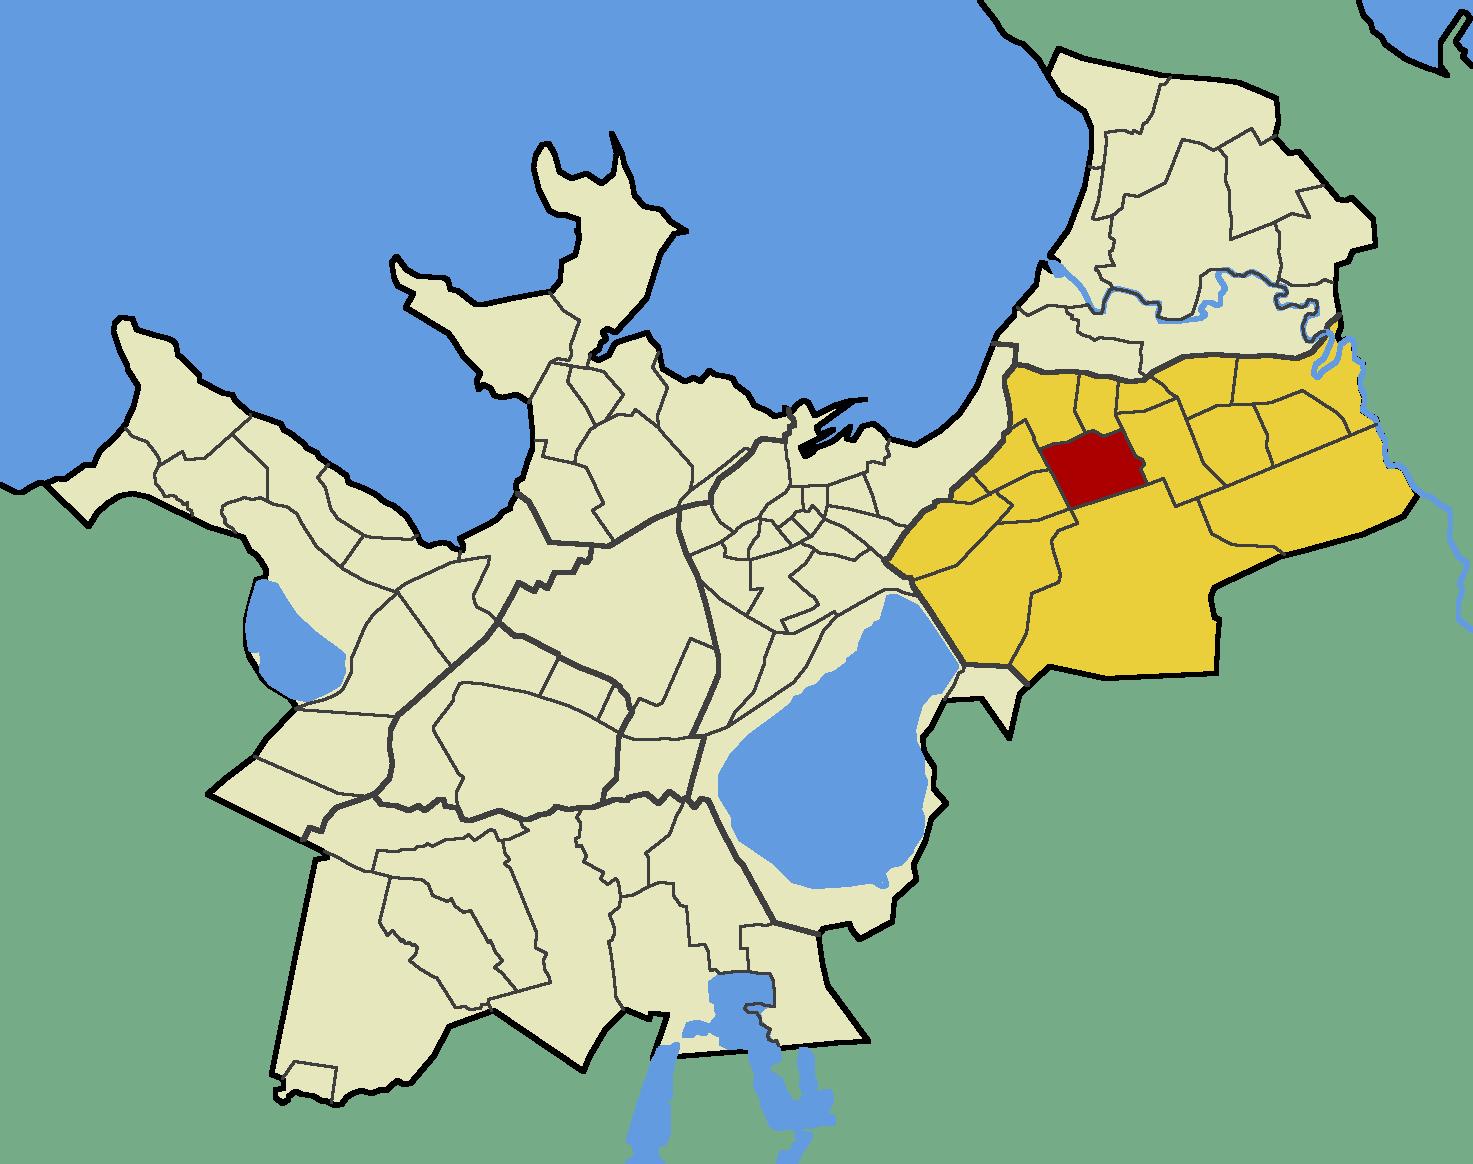 Laagna (Tallinn)